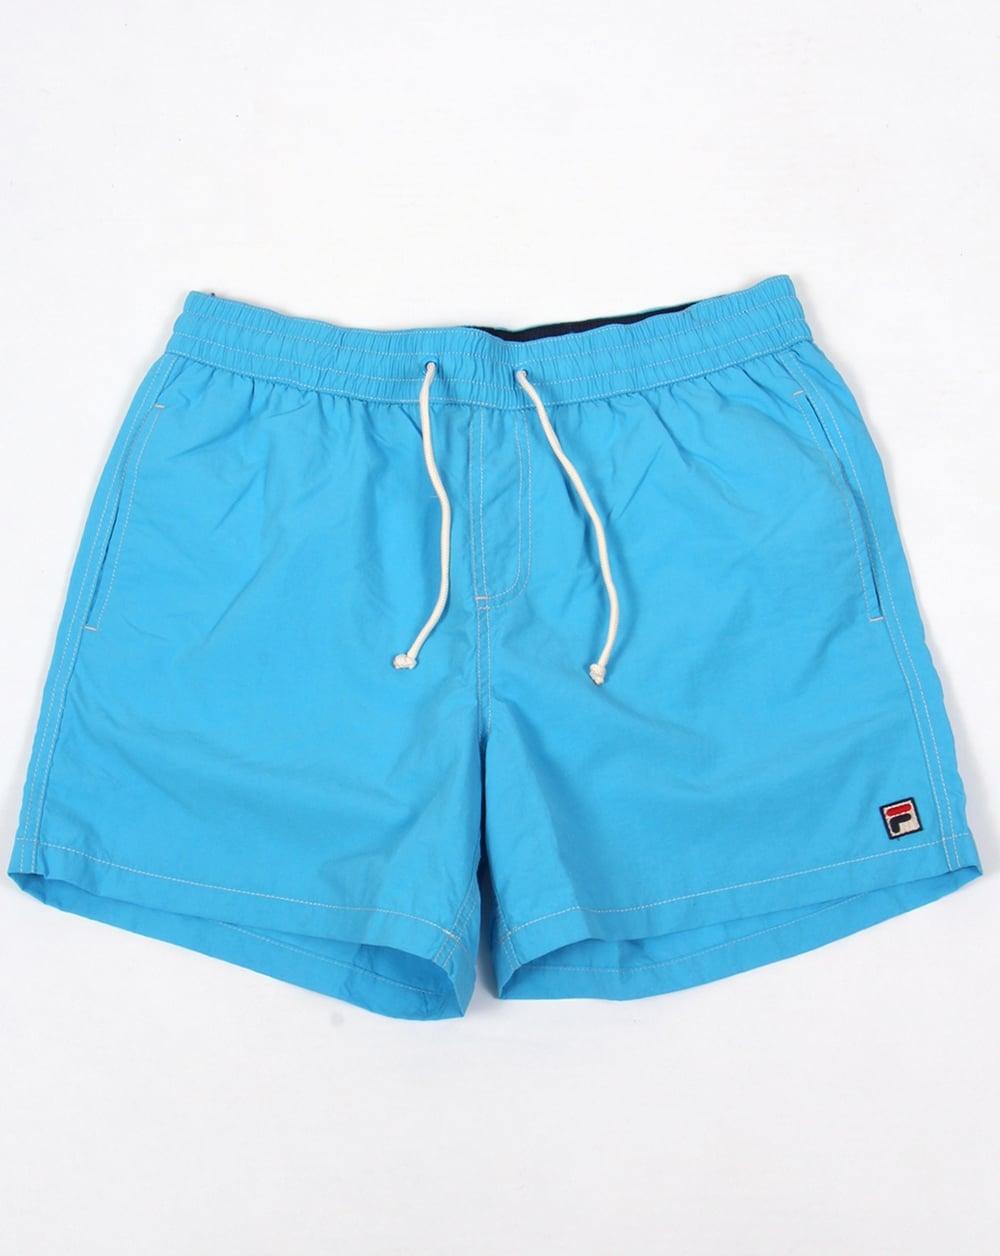 Supremacy Edgar Tennis Shorts Navy - vintage retro tennis